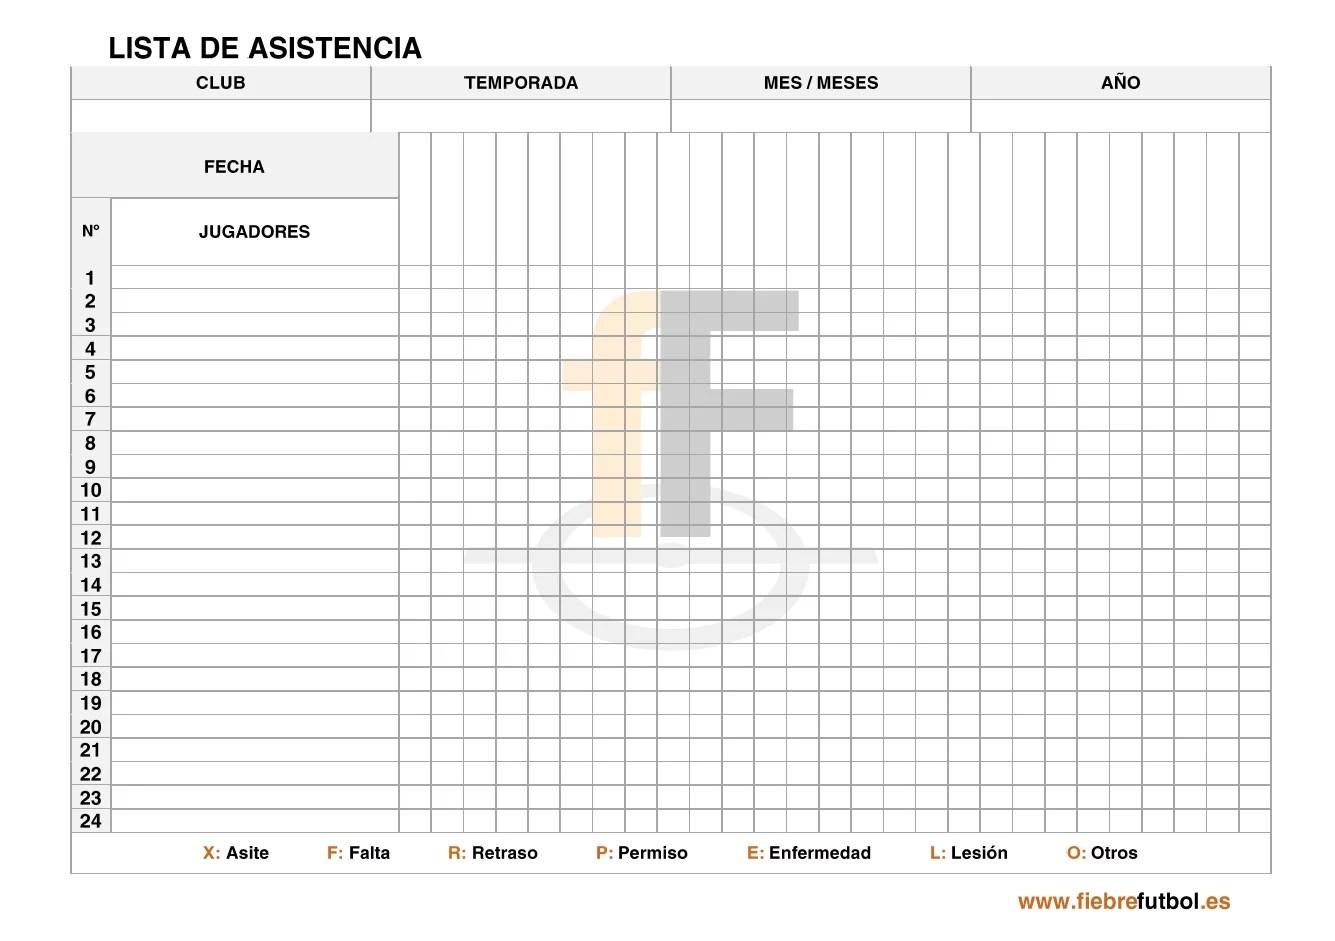 Lista Asistencia 01 FiebreFtbol